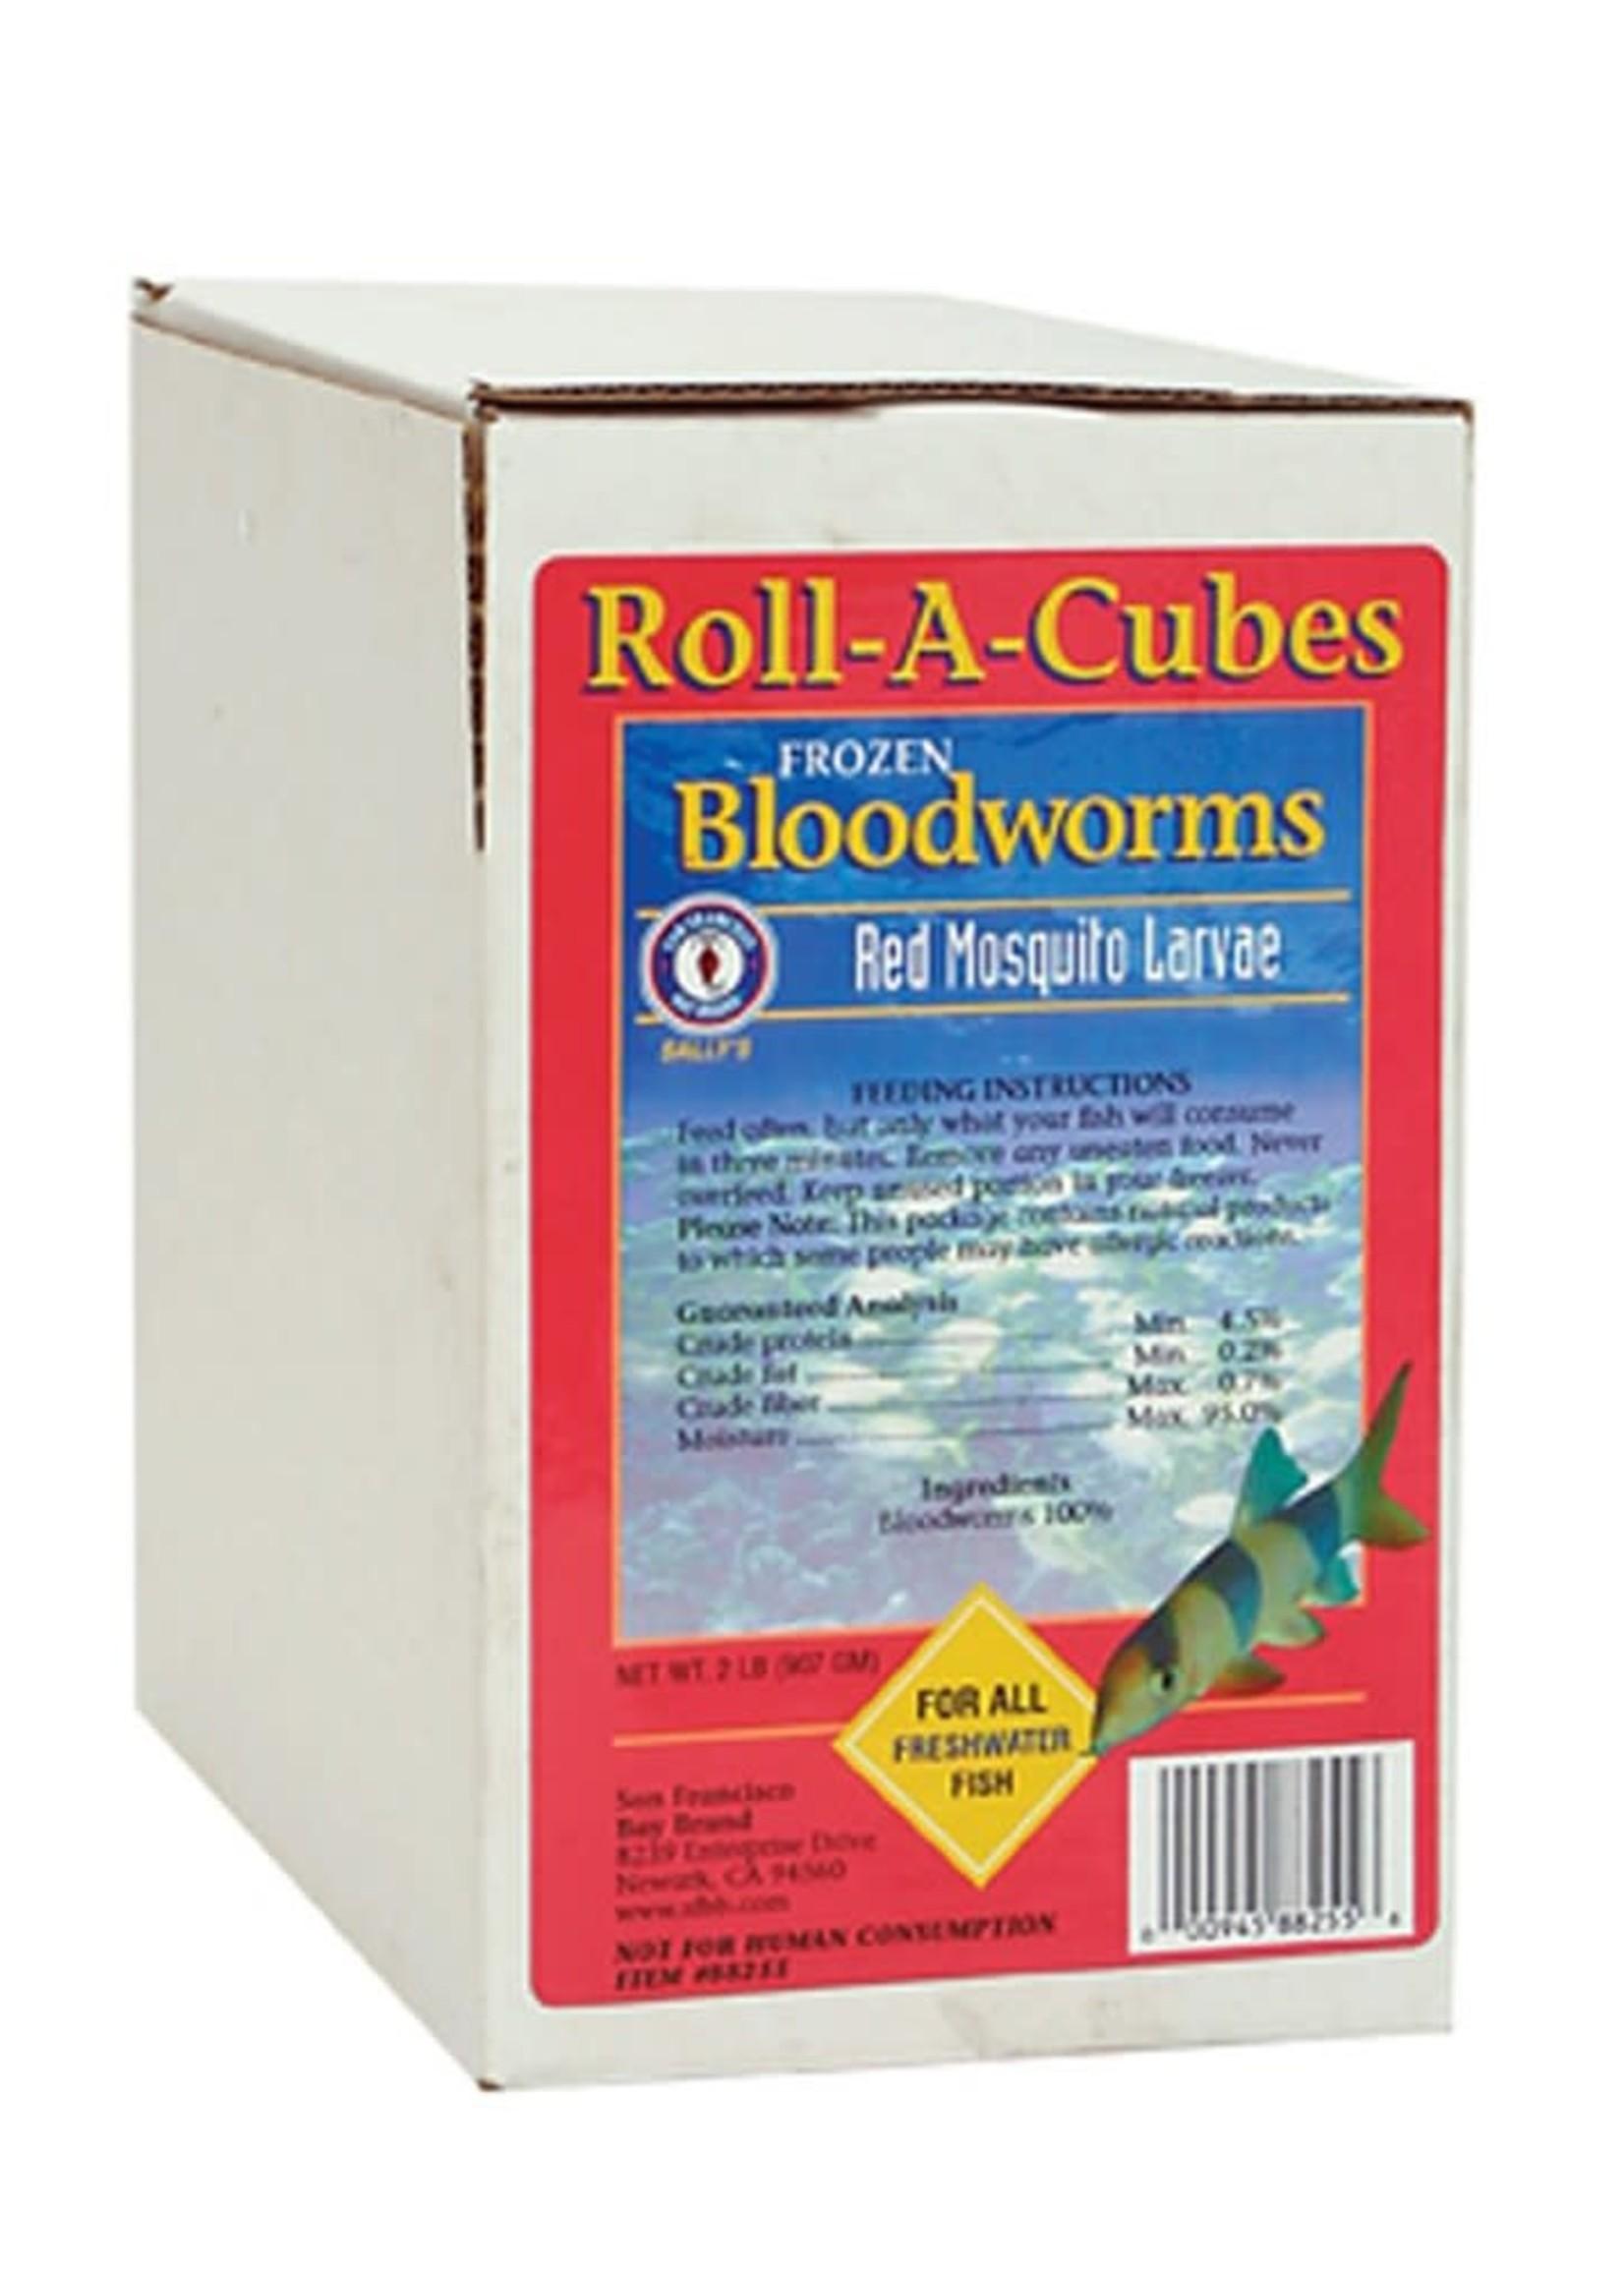 SAN FRANCISCO BAY BRAND INC San Francisco Frozen Bloodworm Roll 2#